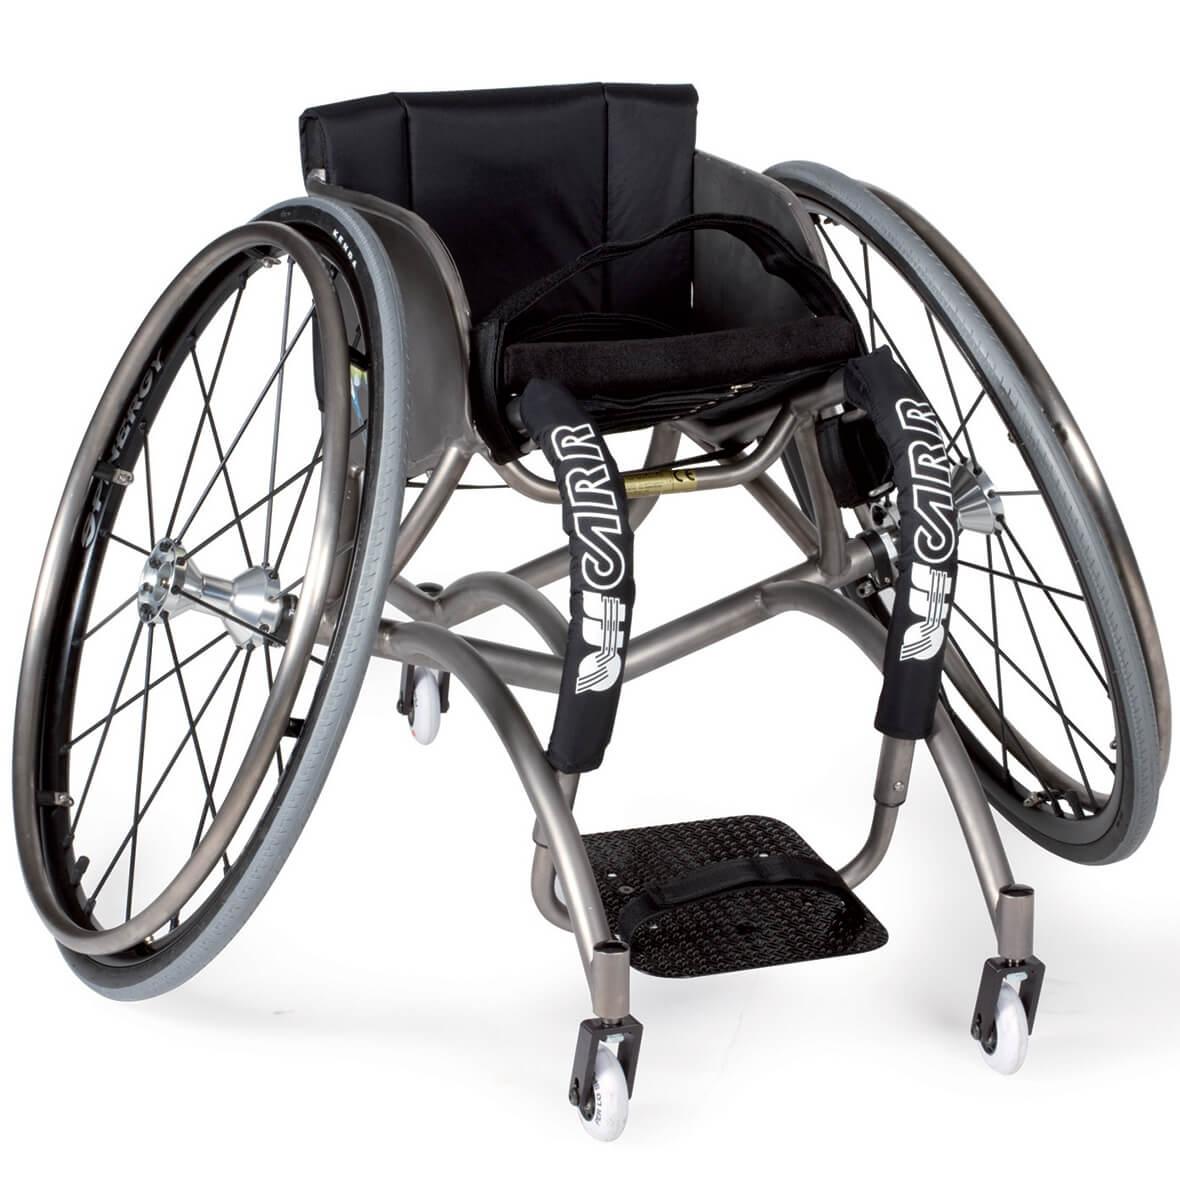 ACE | Mobilitec - Offcarr